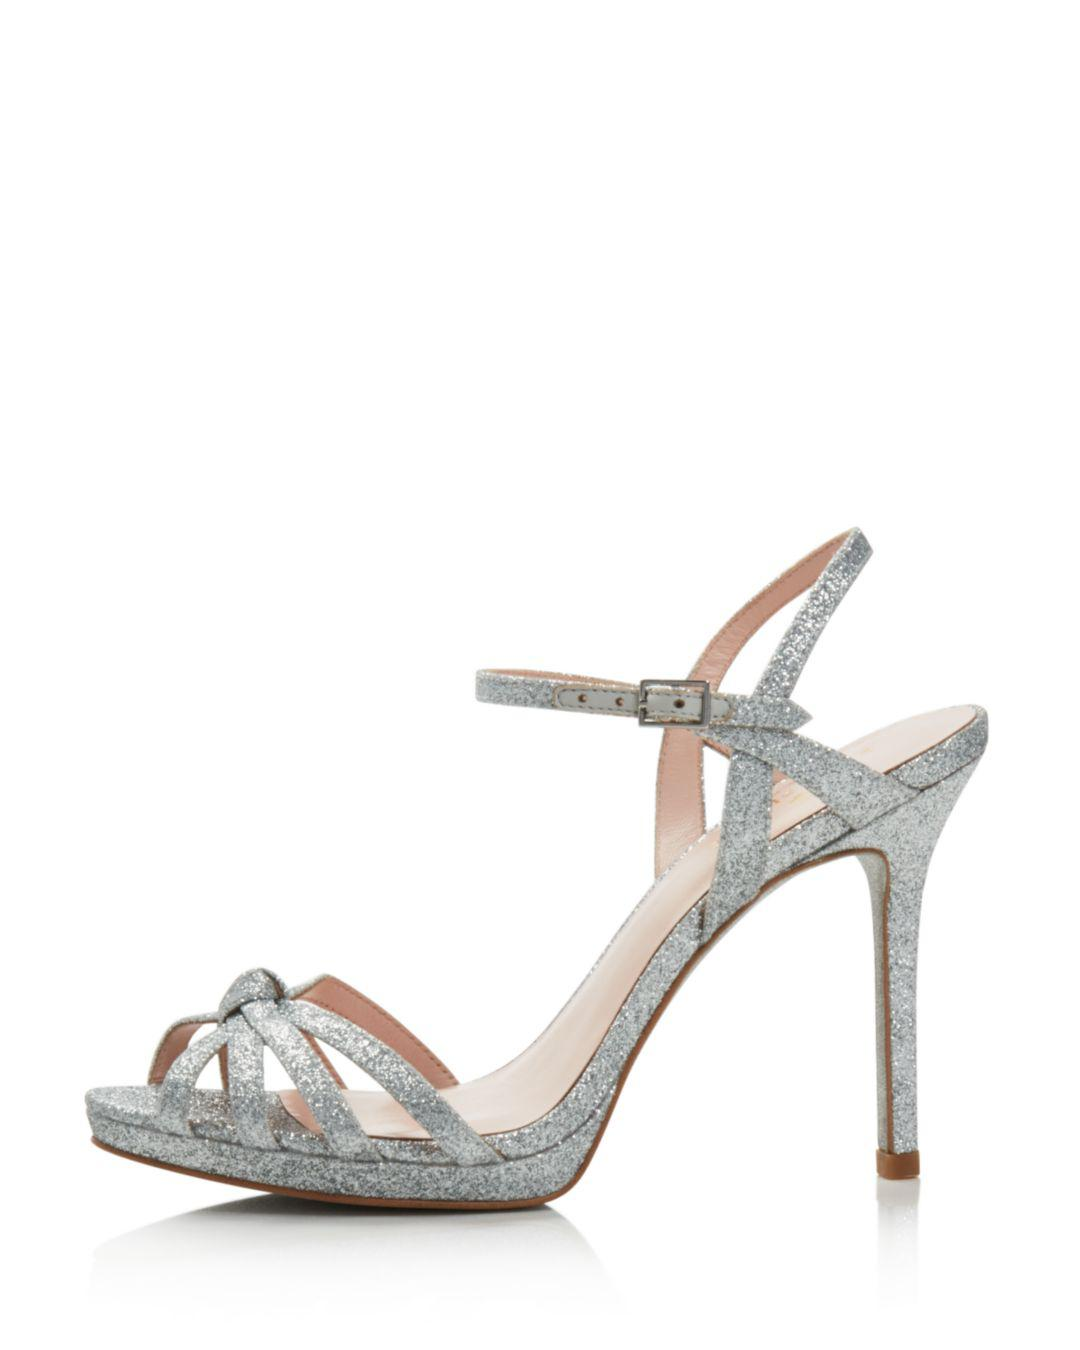 46f1156adfa Lyst - Kate Spade Women s Florence Glittered Leather High-heel ...